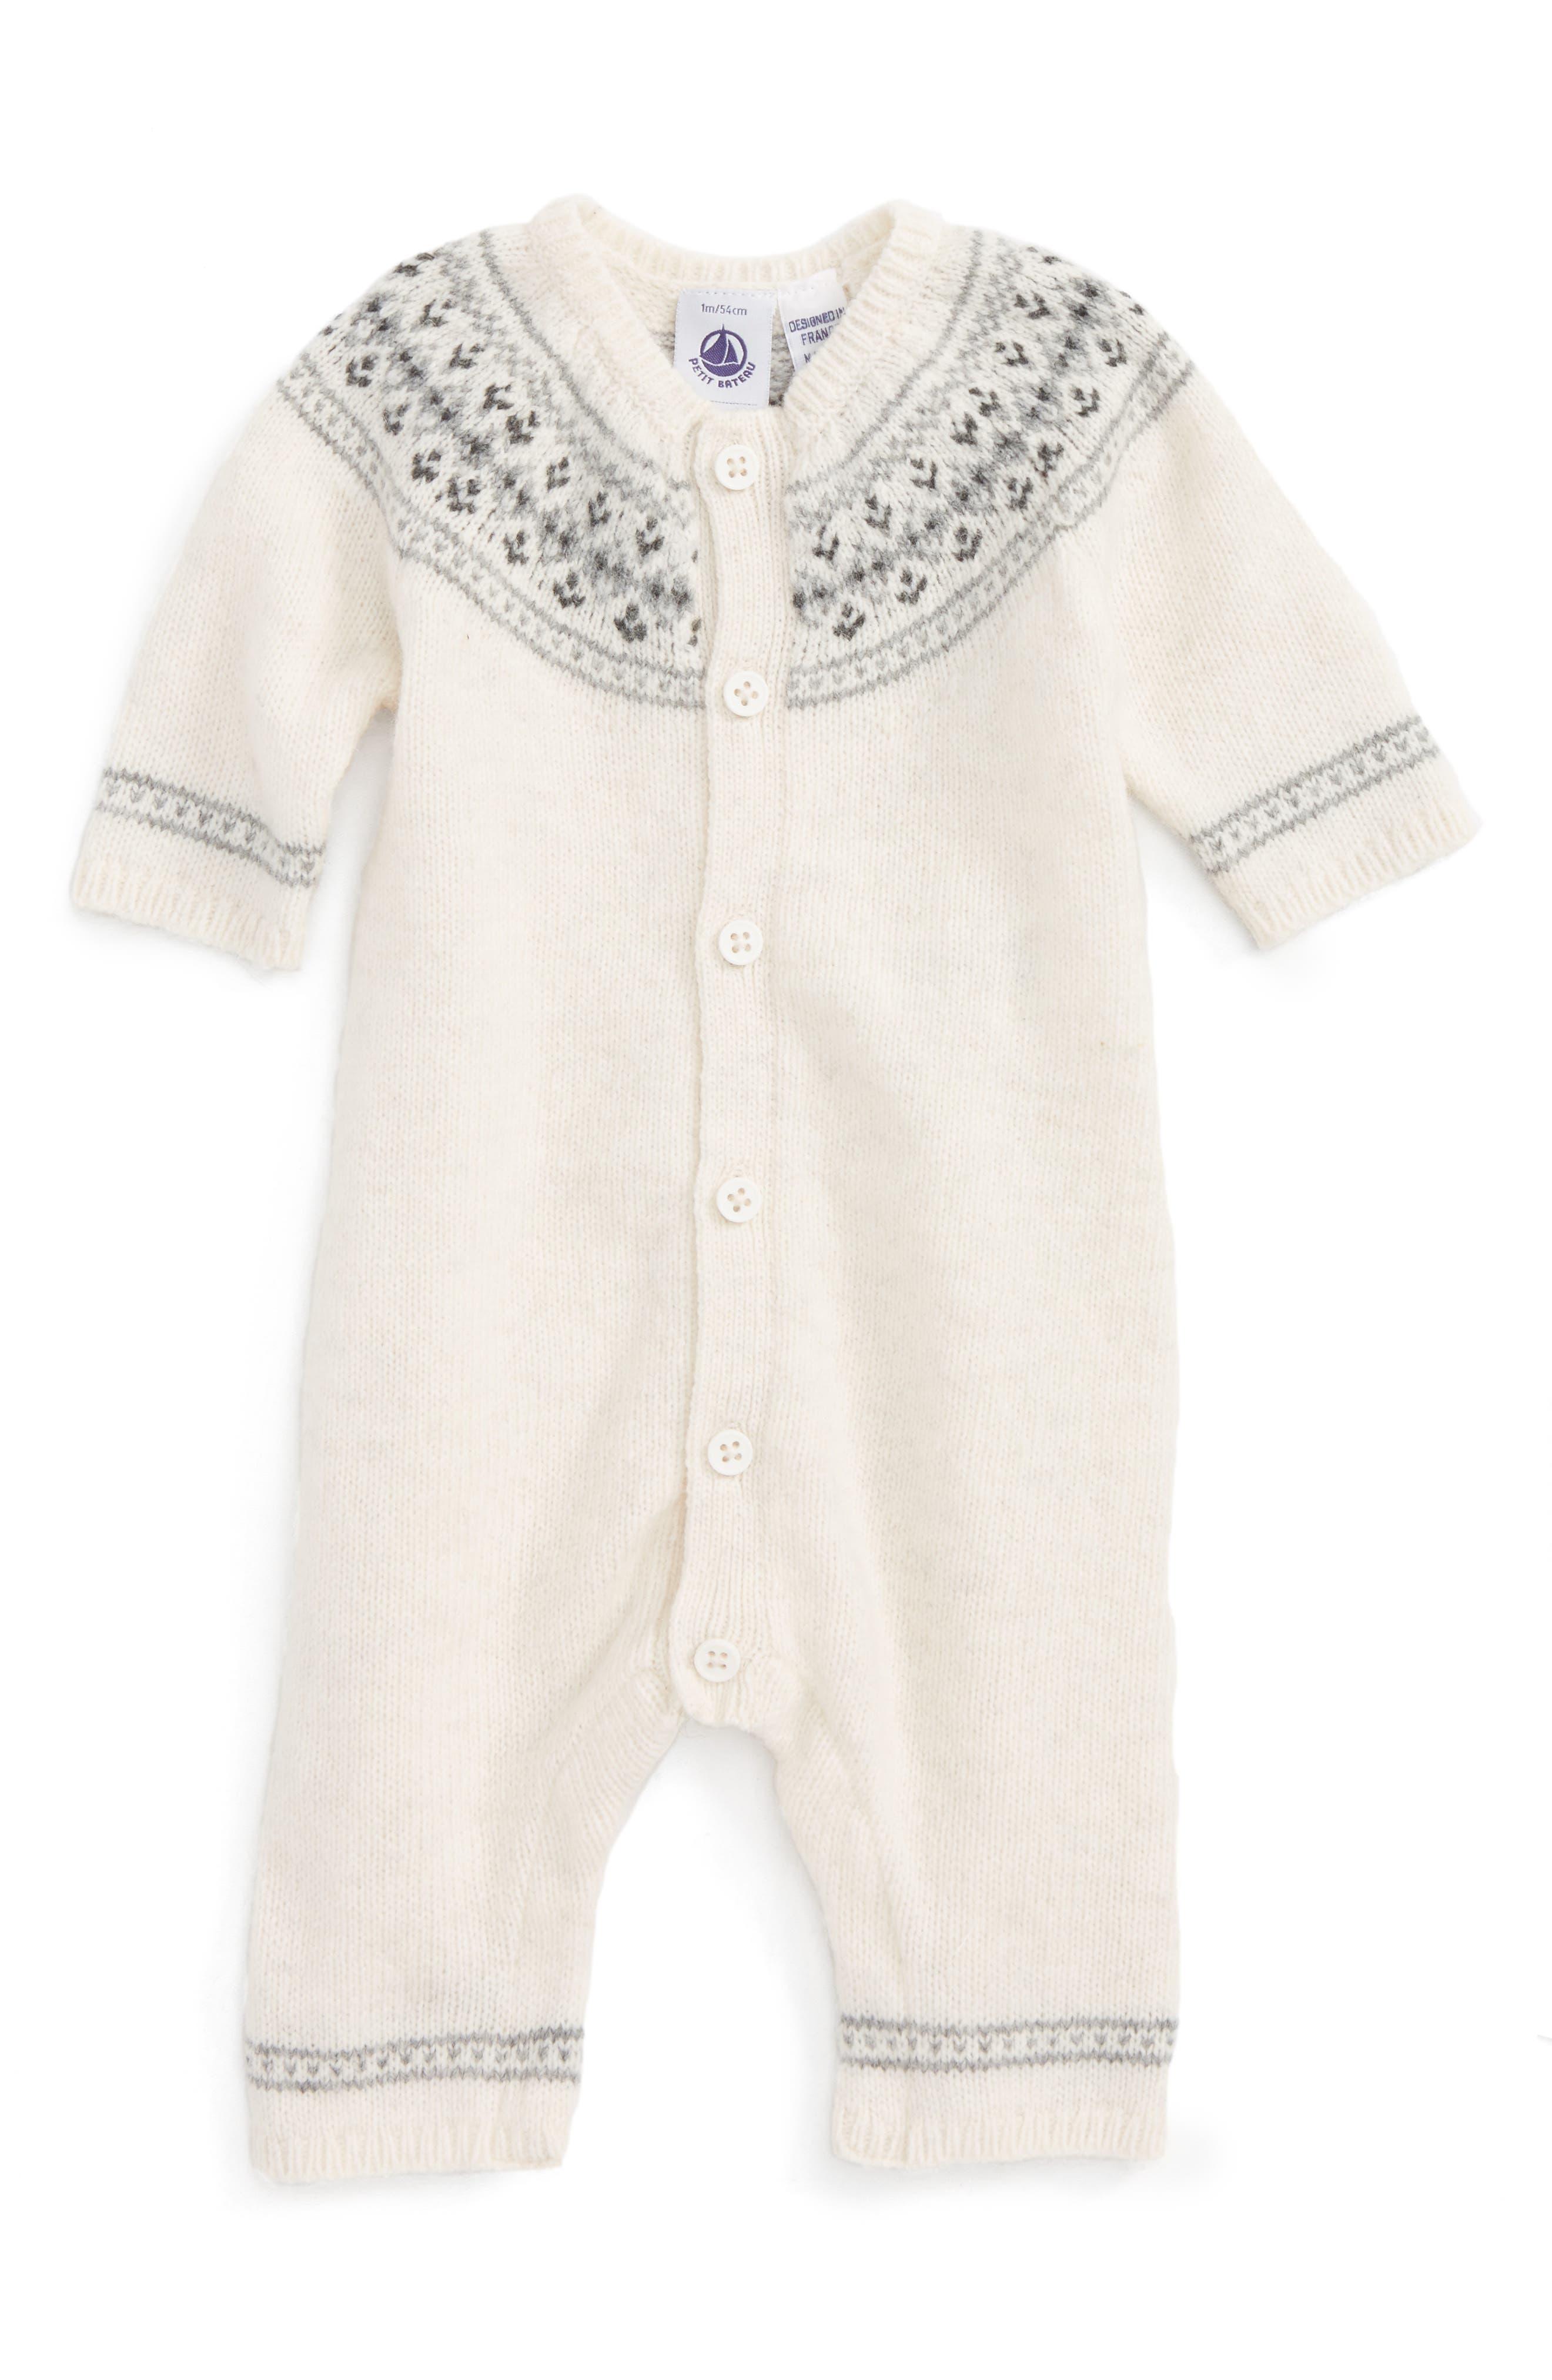 Alternate Image 1 Selected - Petit Bateau Knit Romper (Baby)